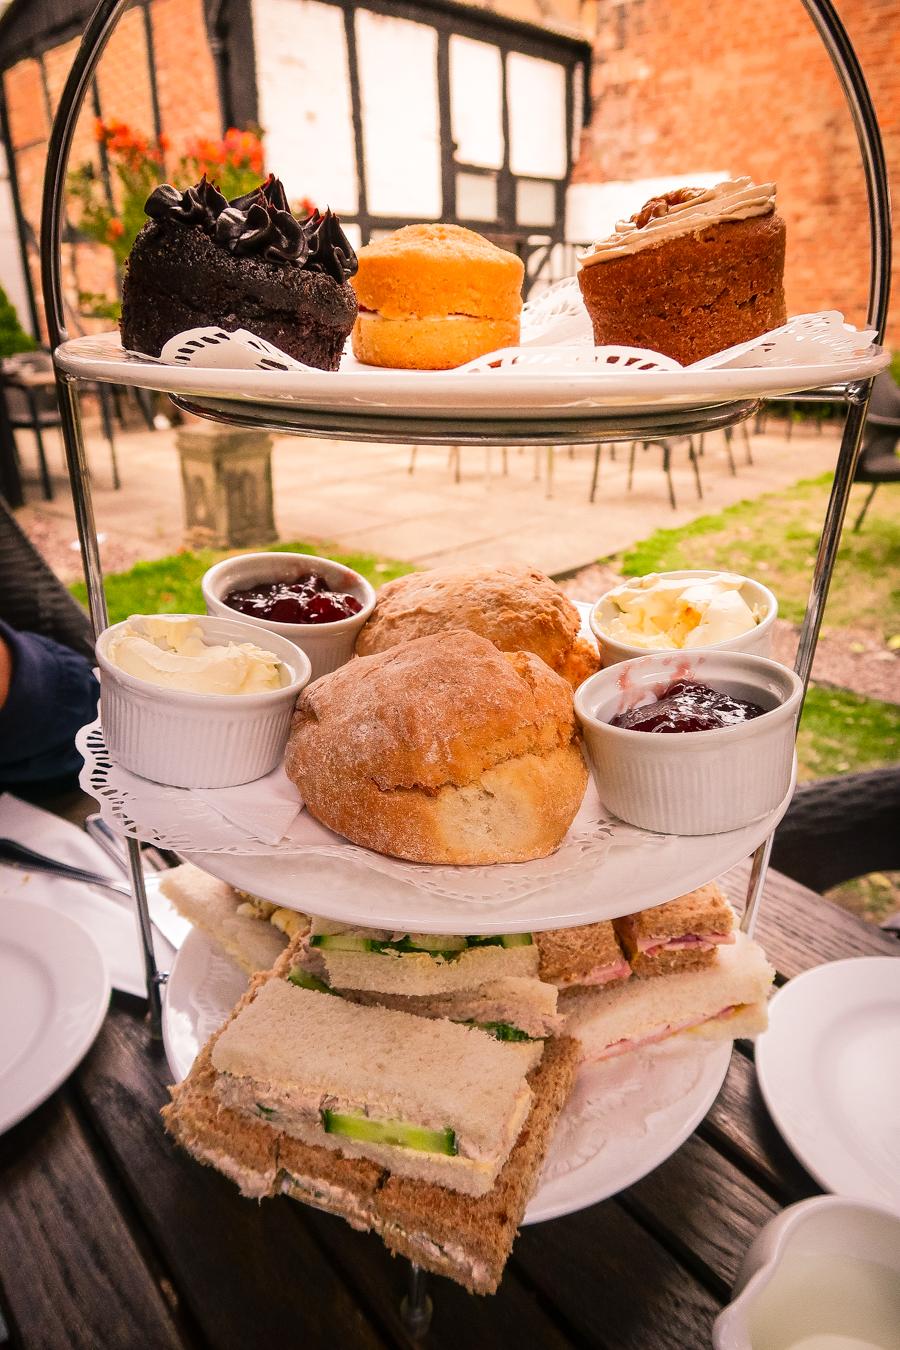 Midsummer's Day Dream - Afternoon Tea at Hathaway Tea Rooms